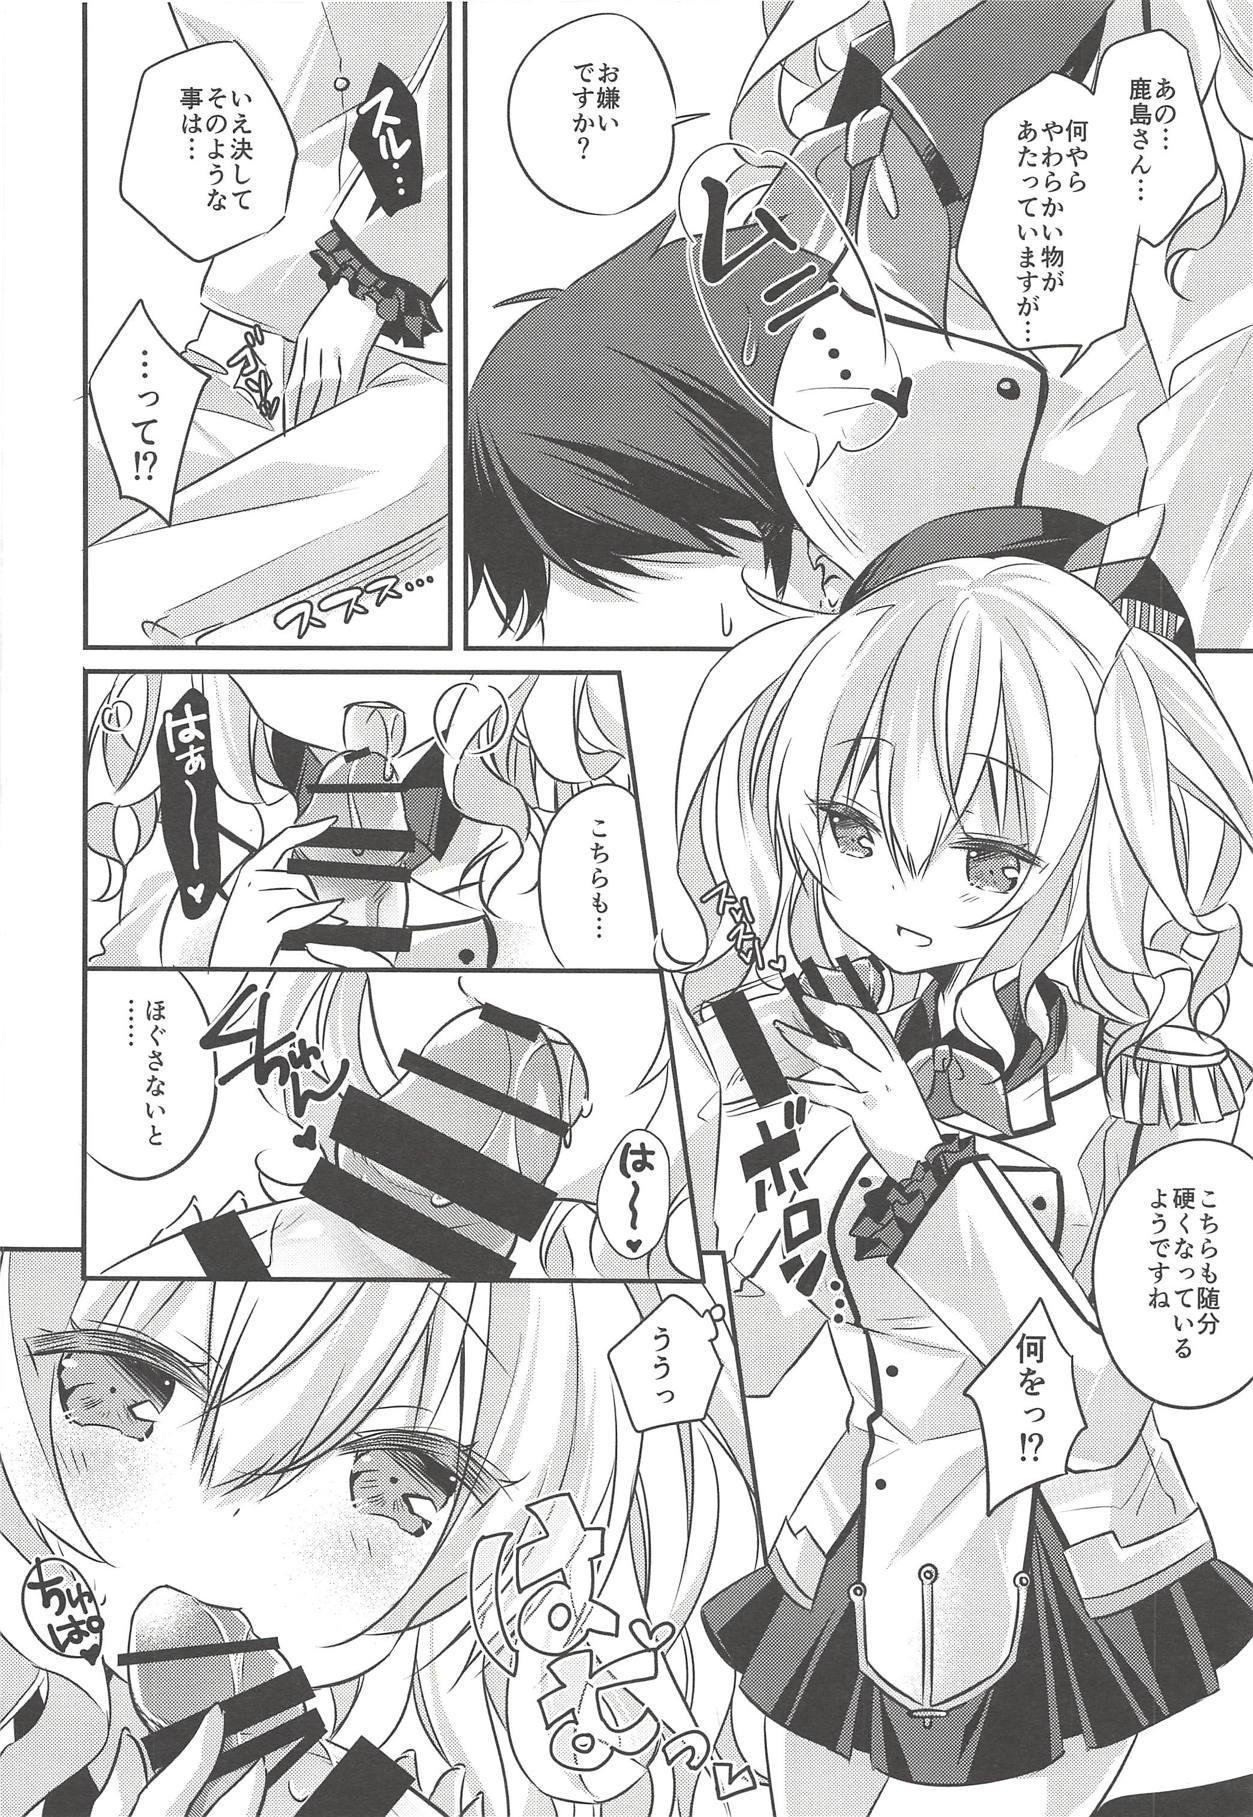 Kashima-san ni Omakase! 4